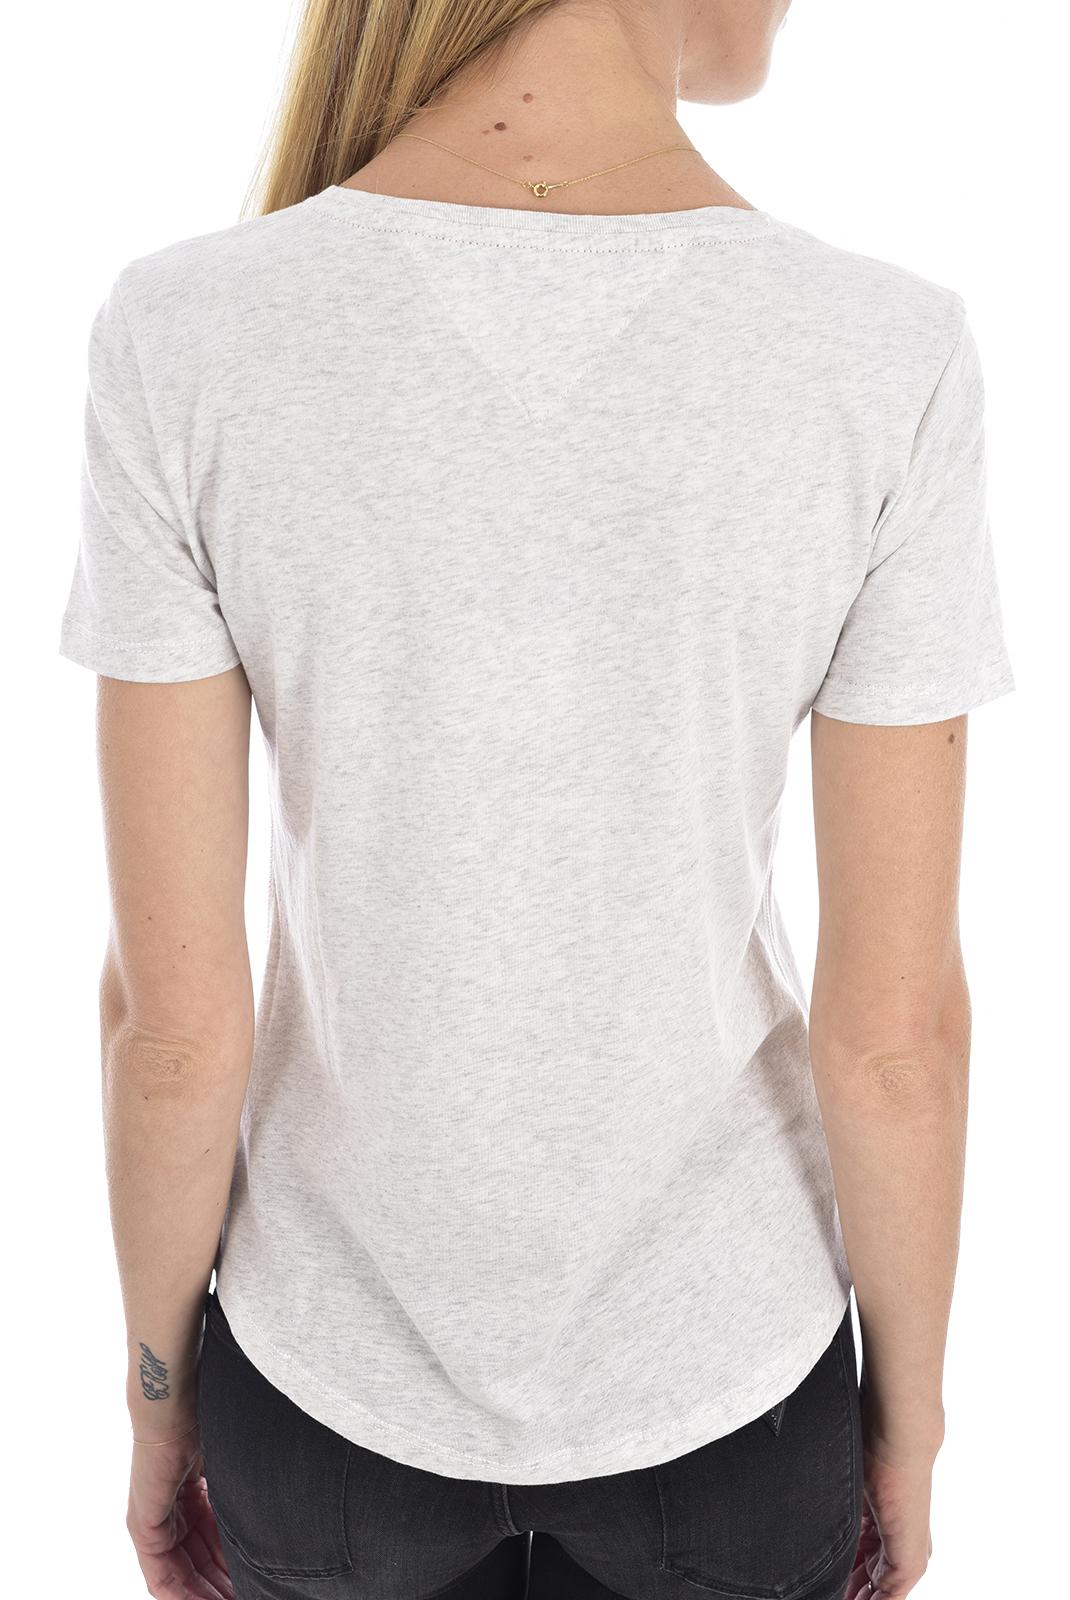 Tee shirt  Tommy hilfiger DW0DW06901 PPP grey htr